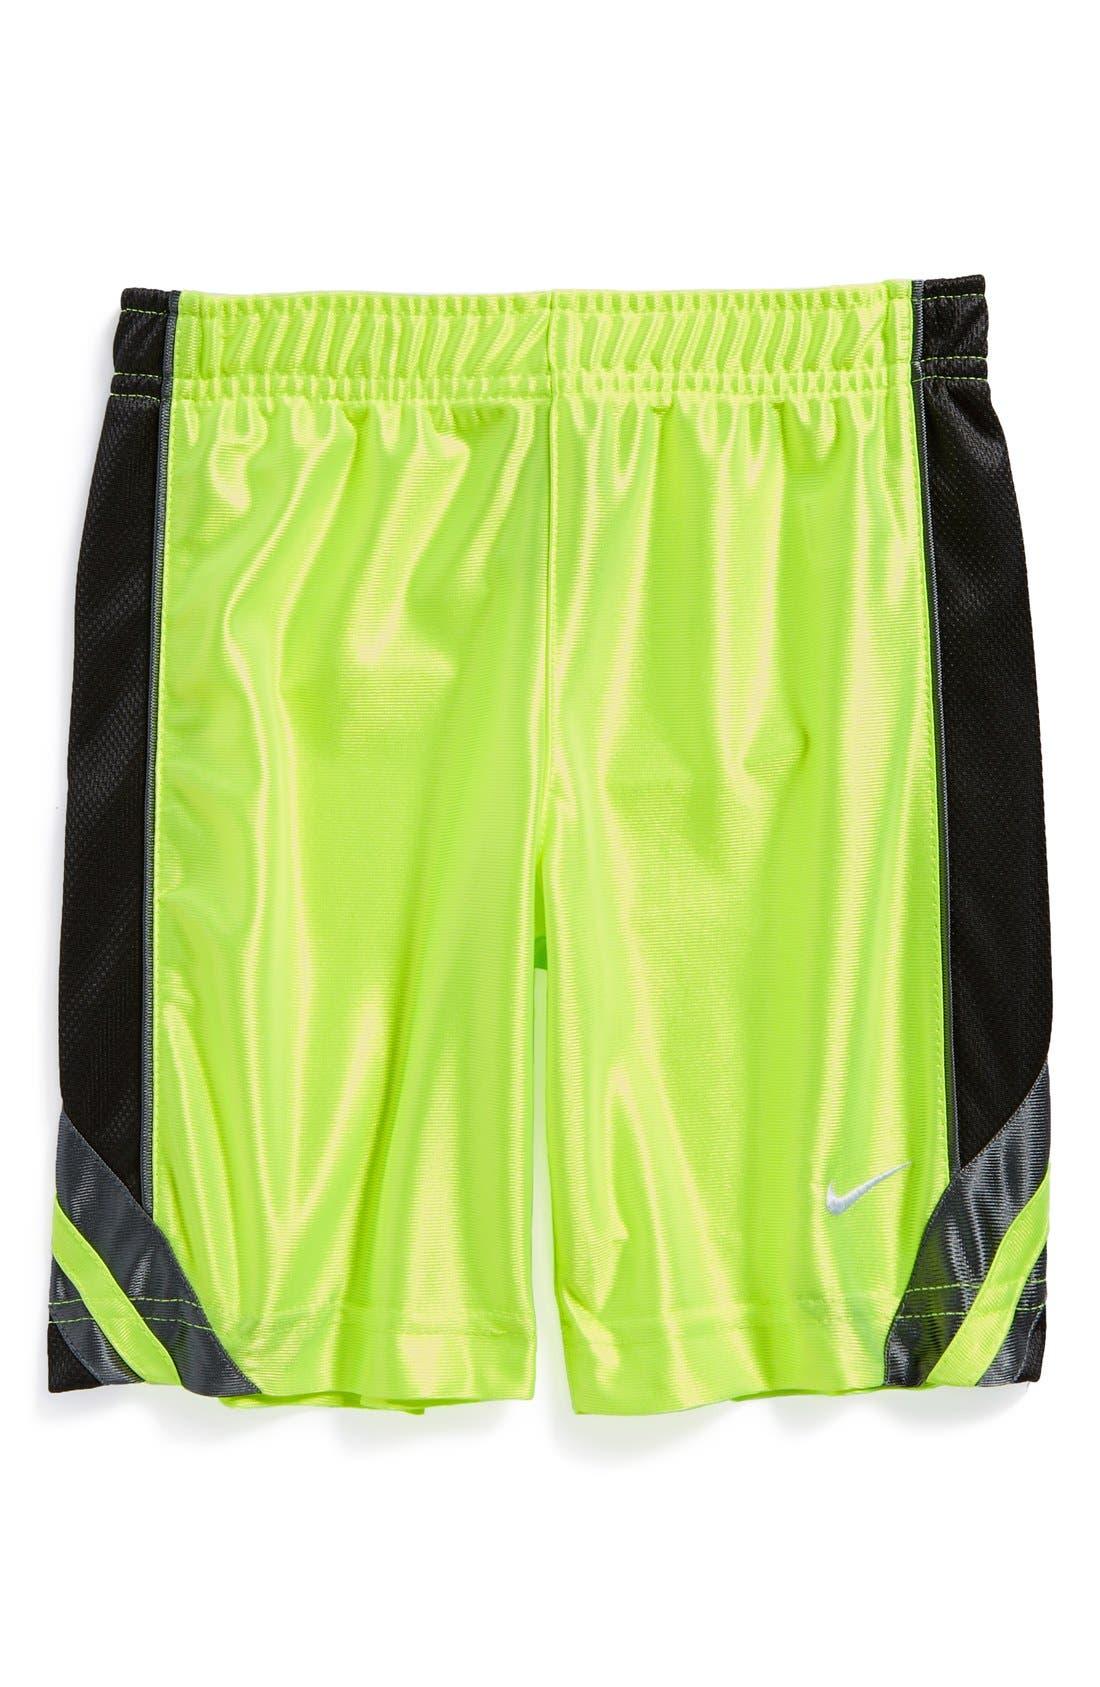 Alternate Image 1 Selected - Nike 'Dunk V2' Shorts (Little Boys)